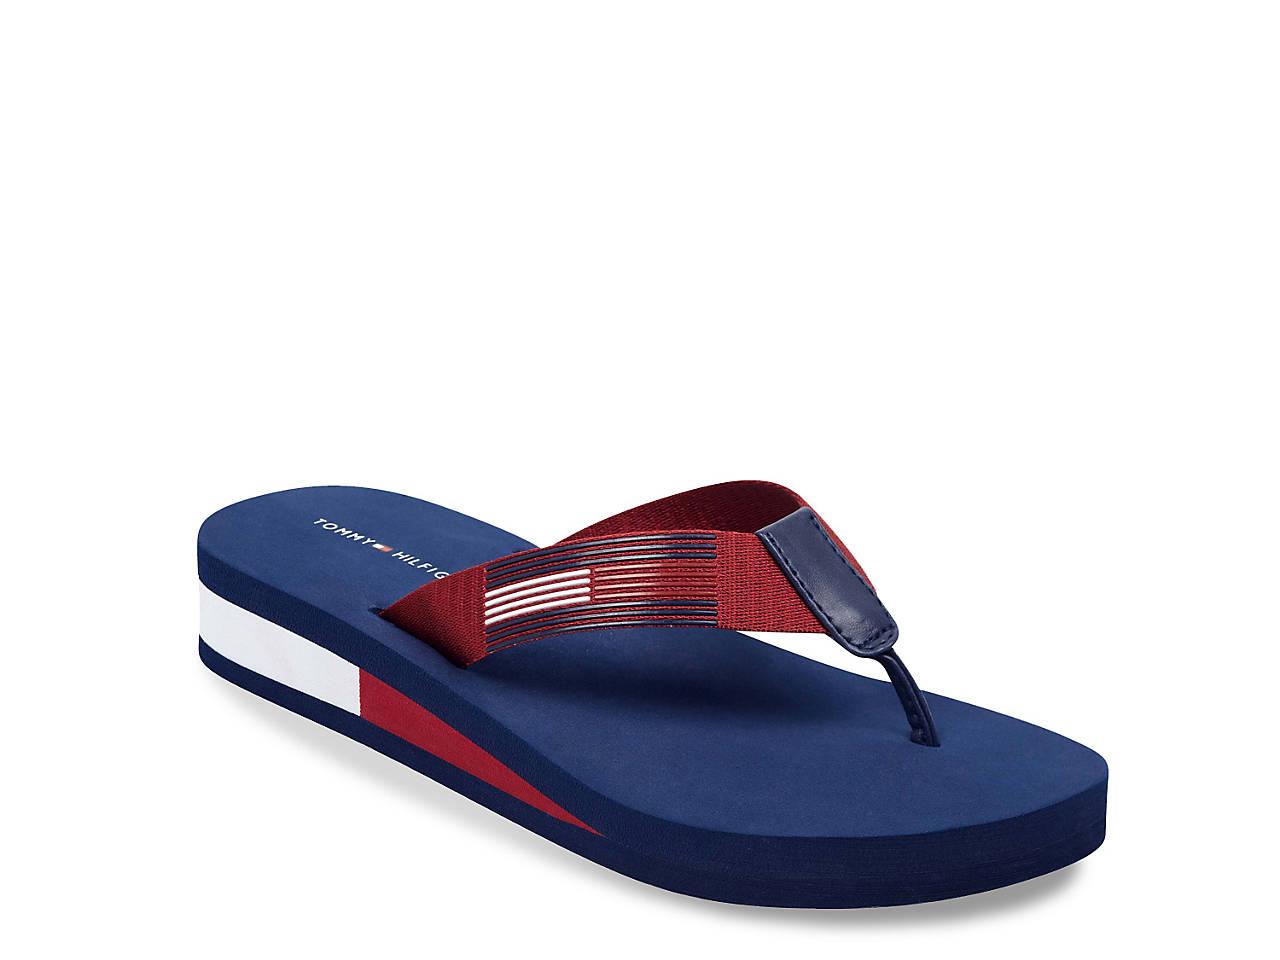 ce3bdfebf1f Tommy Hilfiger Natili Wedge Flip Flop Men s Shoes